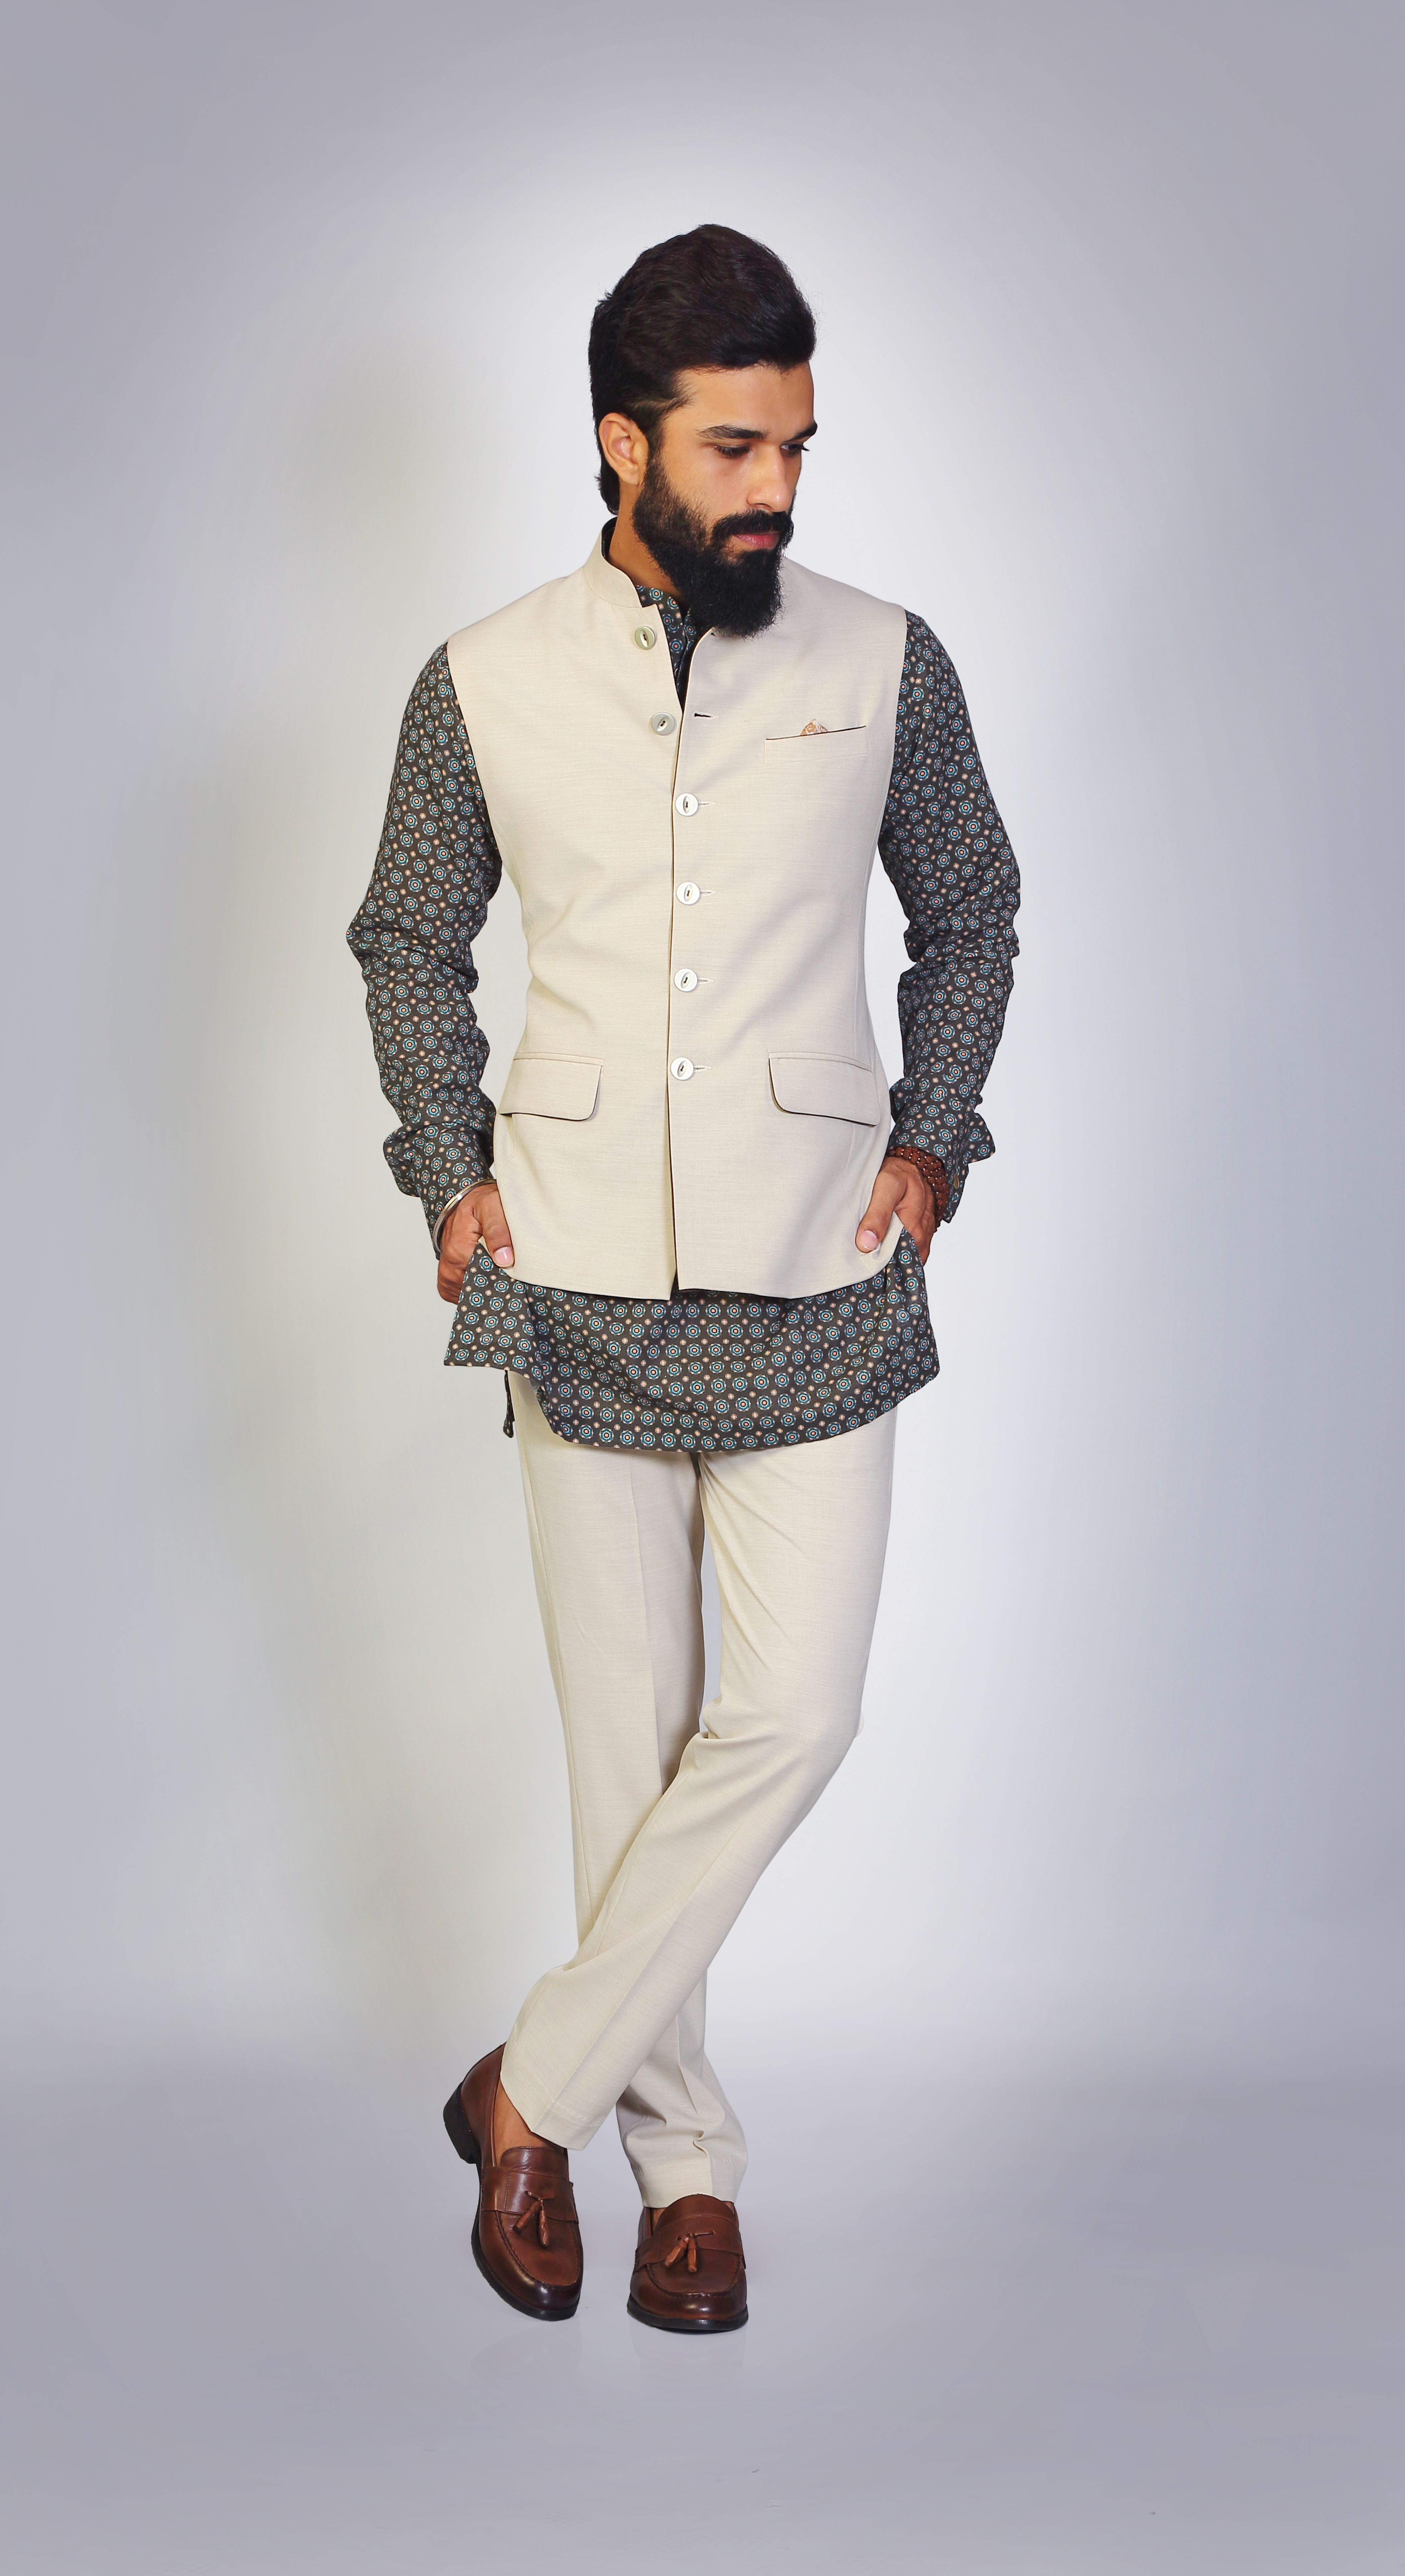 Pastel Ivory Sleeveless Suit Printed Short Kurta Simple Elegant Stylish Https Goo Gl M3tjsh Fashion Suits For Men Mens Fashion Wear Formal Men Outfit [ 7700 x 4200 Pixel ]